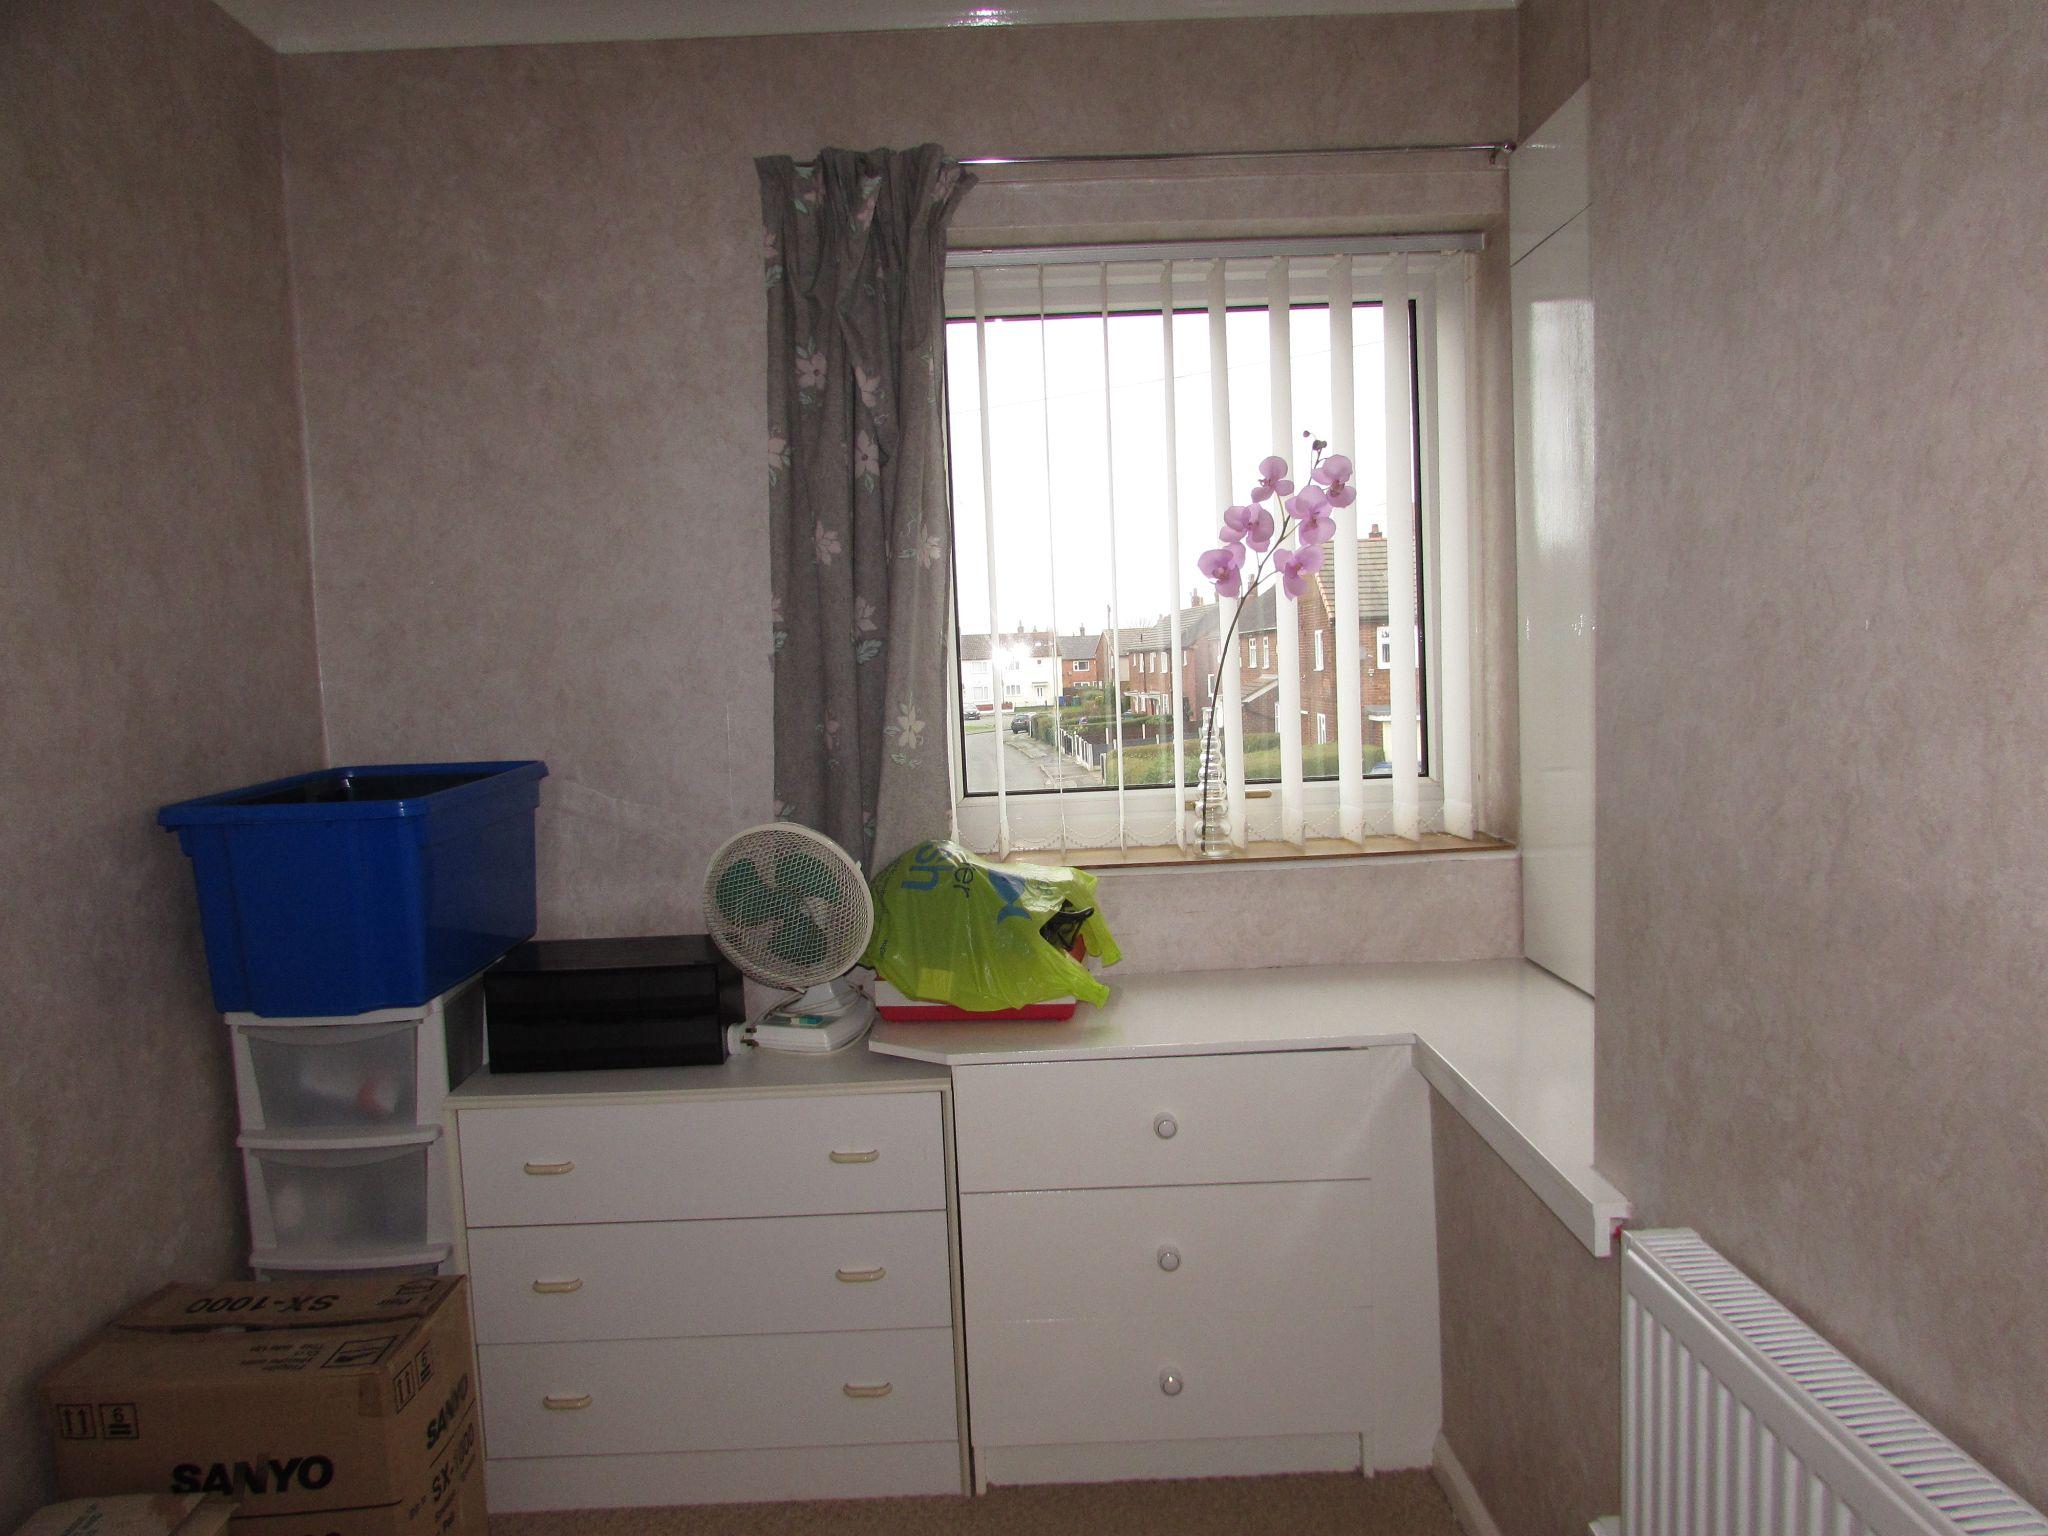 3 Bedroom Mid Terraced House For Sale - Bedroom 3